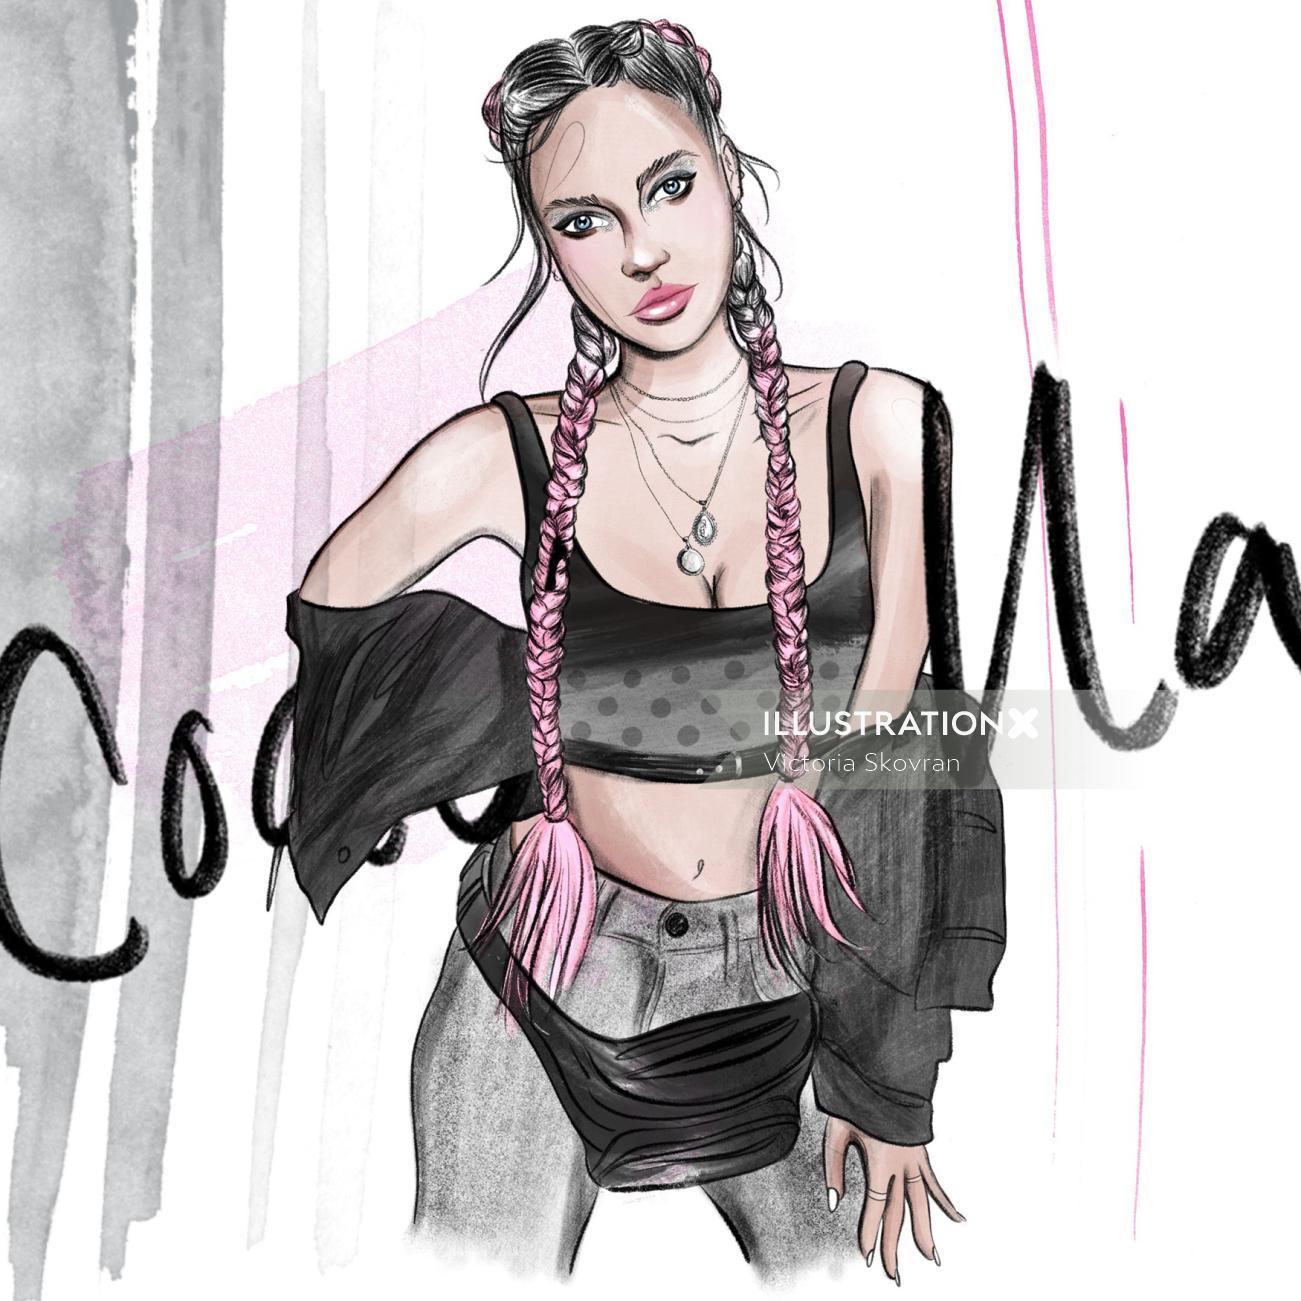 Fashion illustration of woman in coachella style